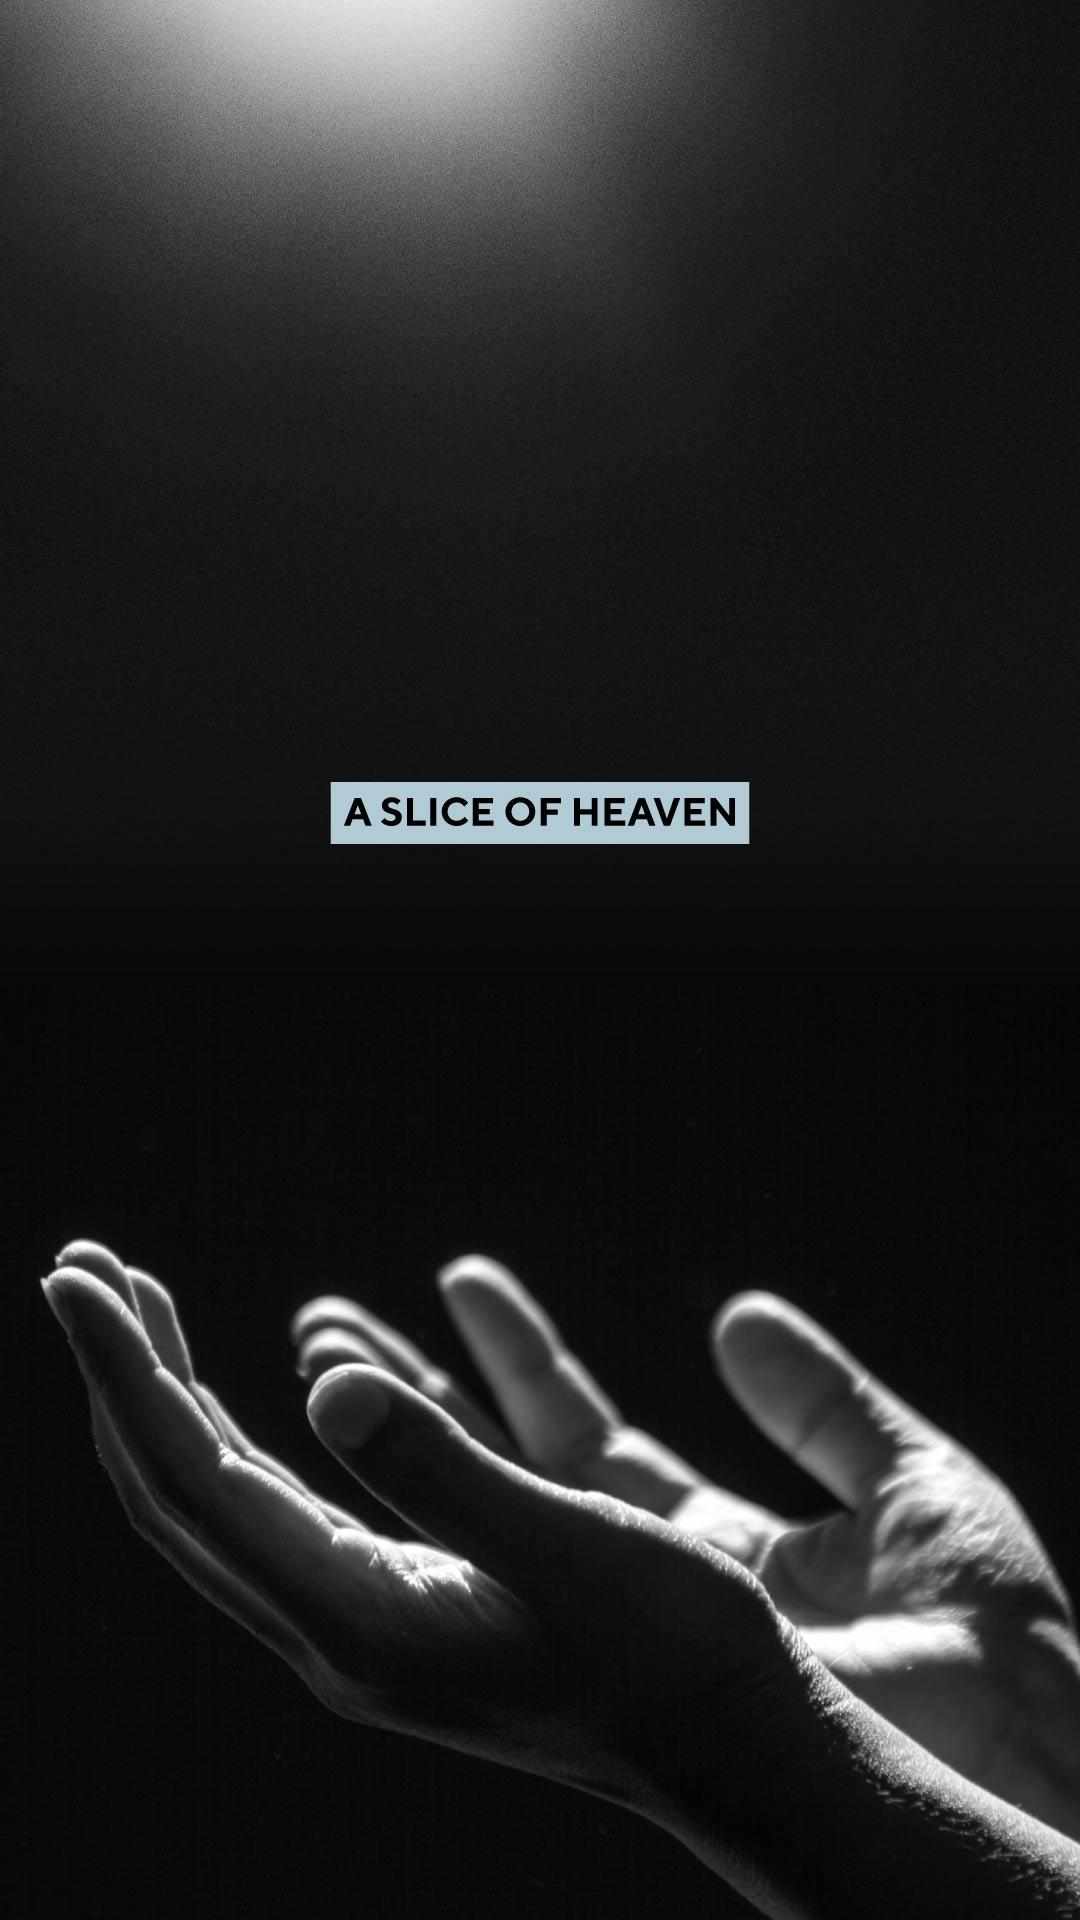 light-city-a-slice-of-heaven